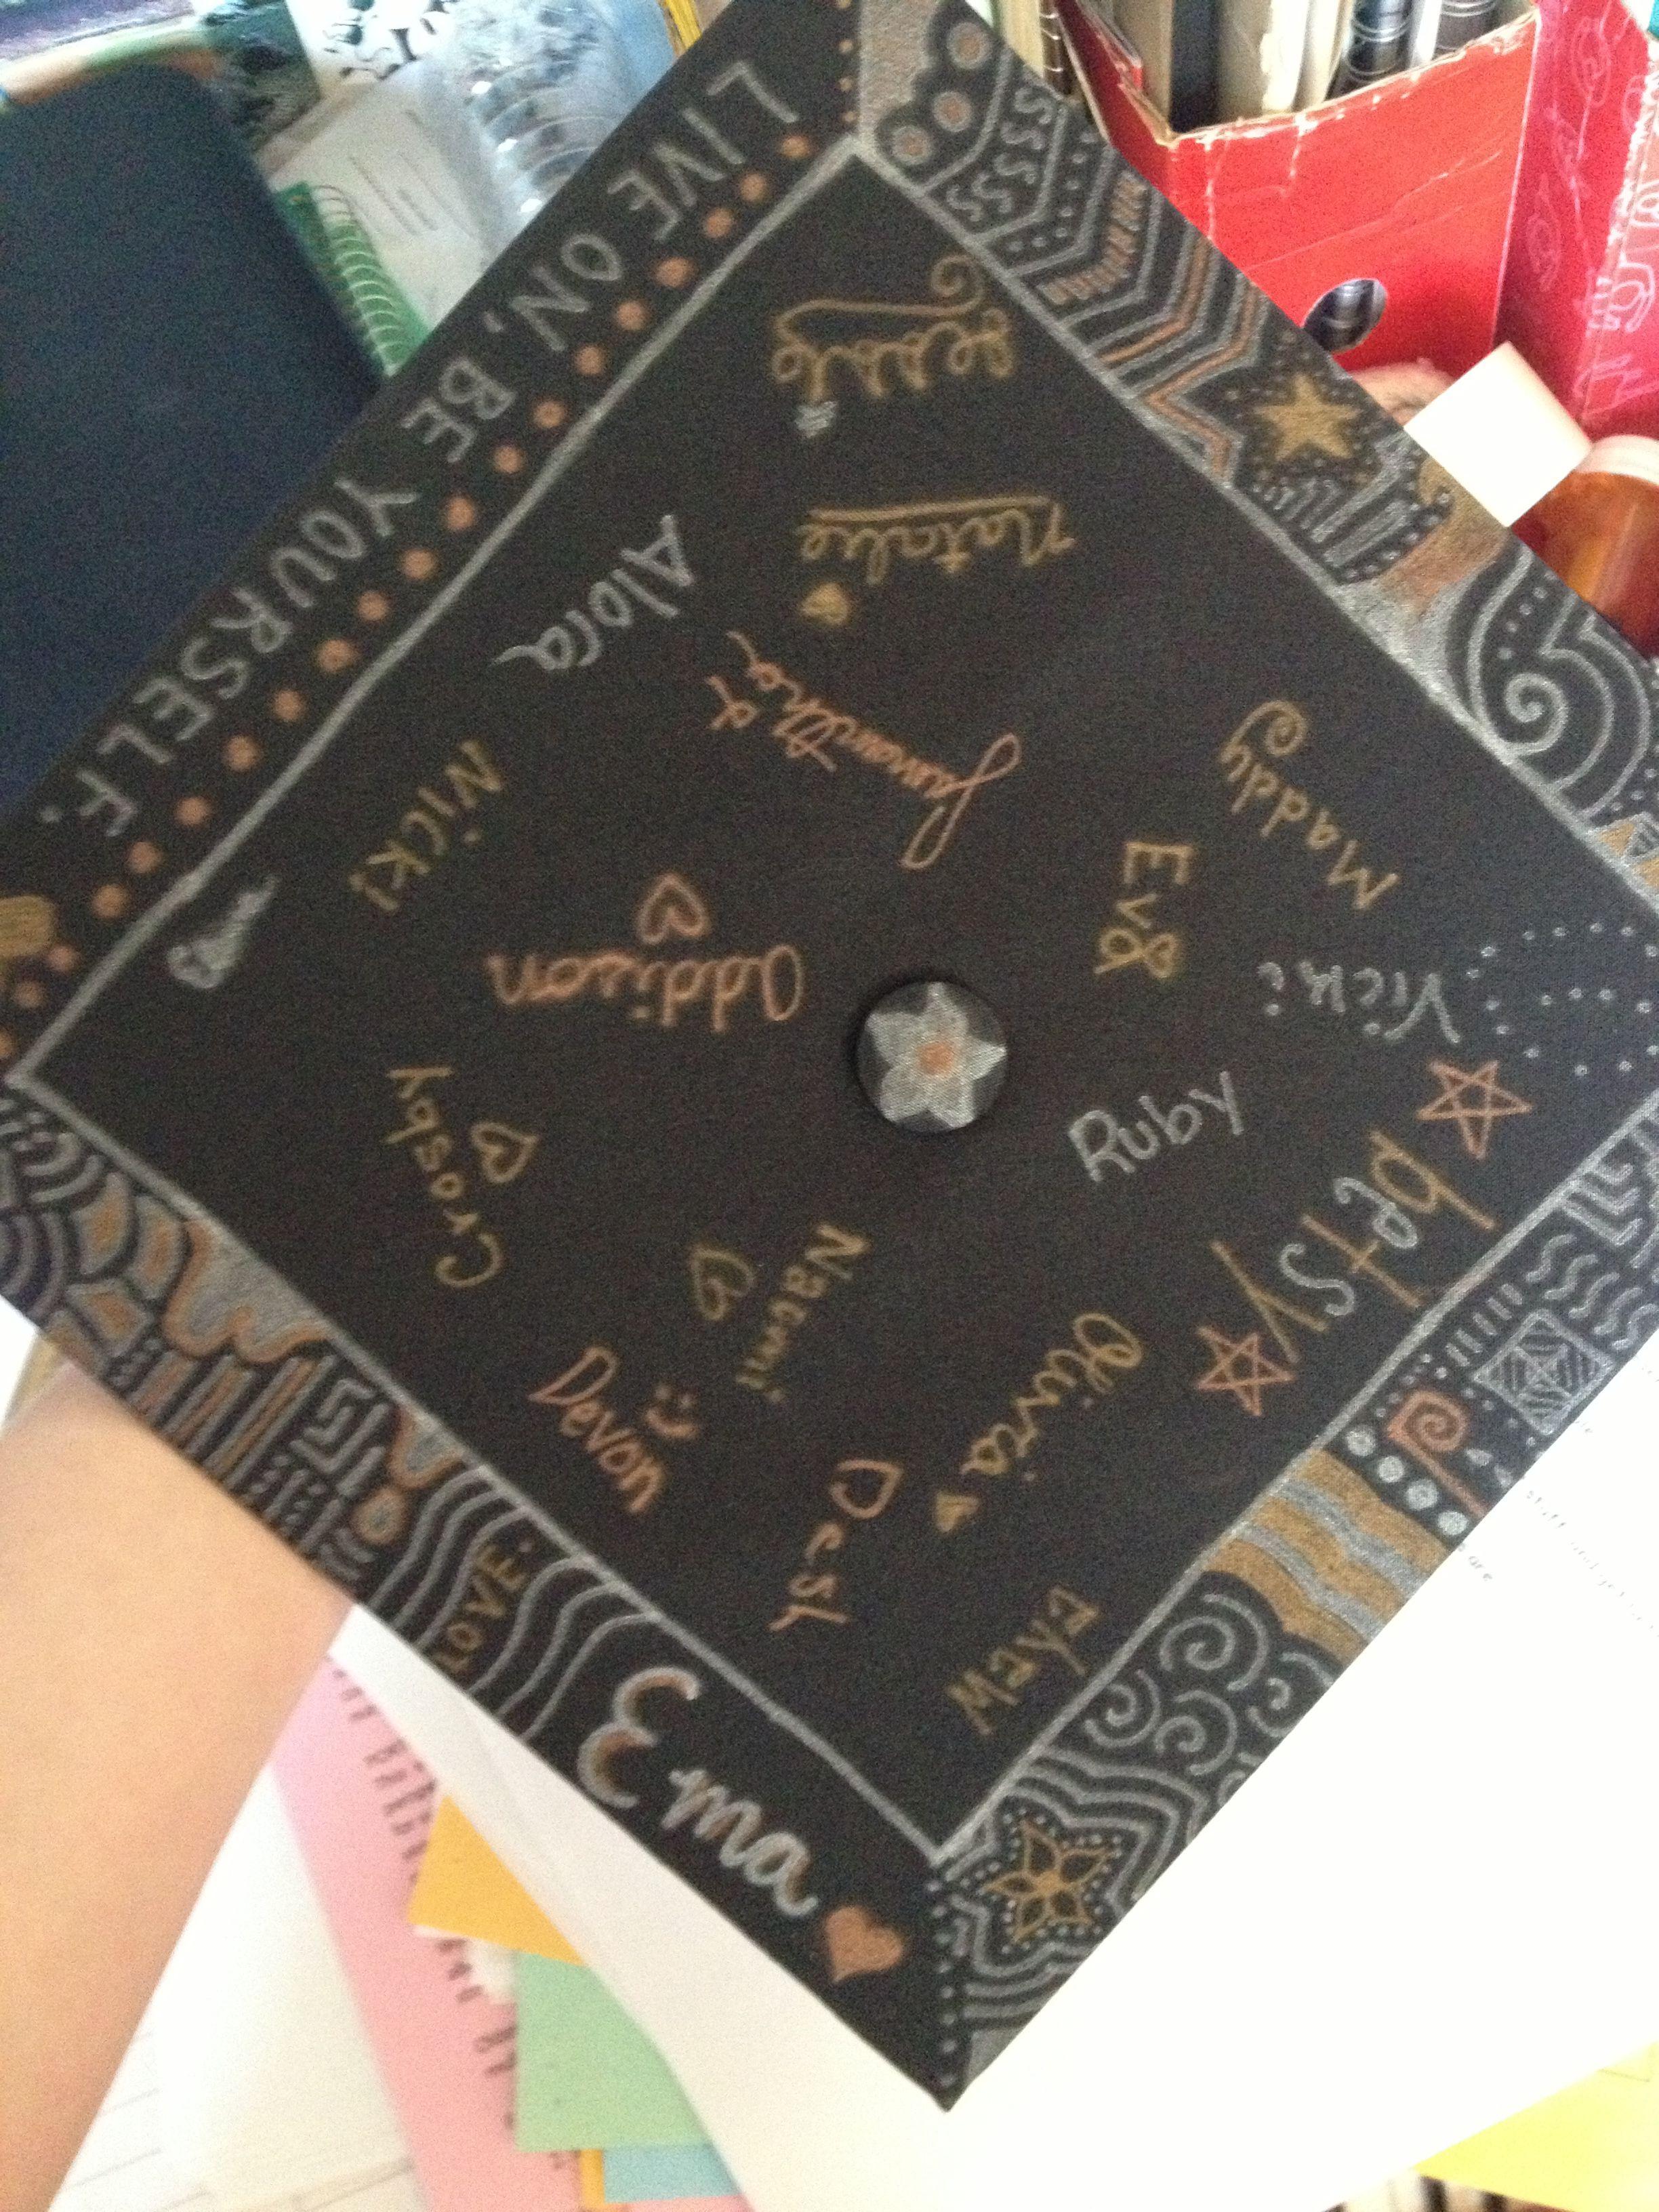 Decorating graduation cap ideas for teachers - For Student Teachers Let Your Students Decorate Your Graduation Cap